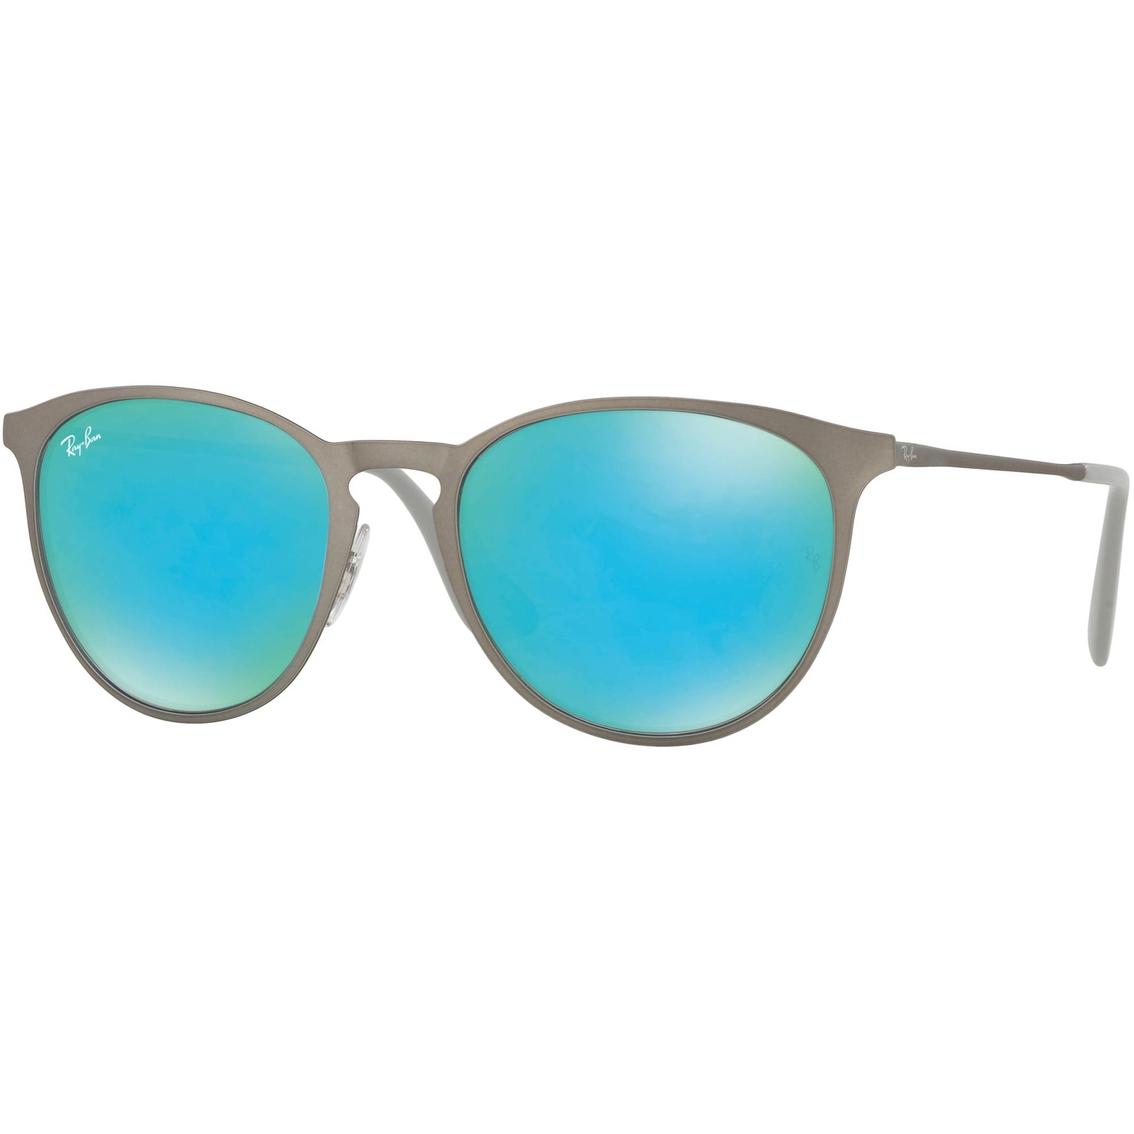 Ray Ban Mirrored Lens Wayfarer Metal Sunglasses Unisex Sunglasses